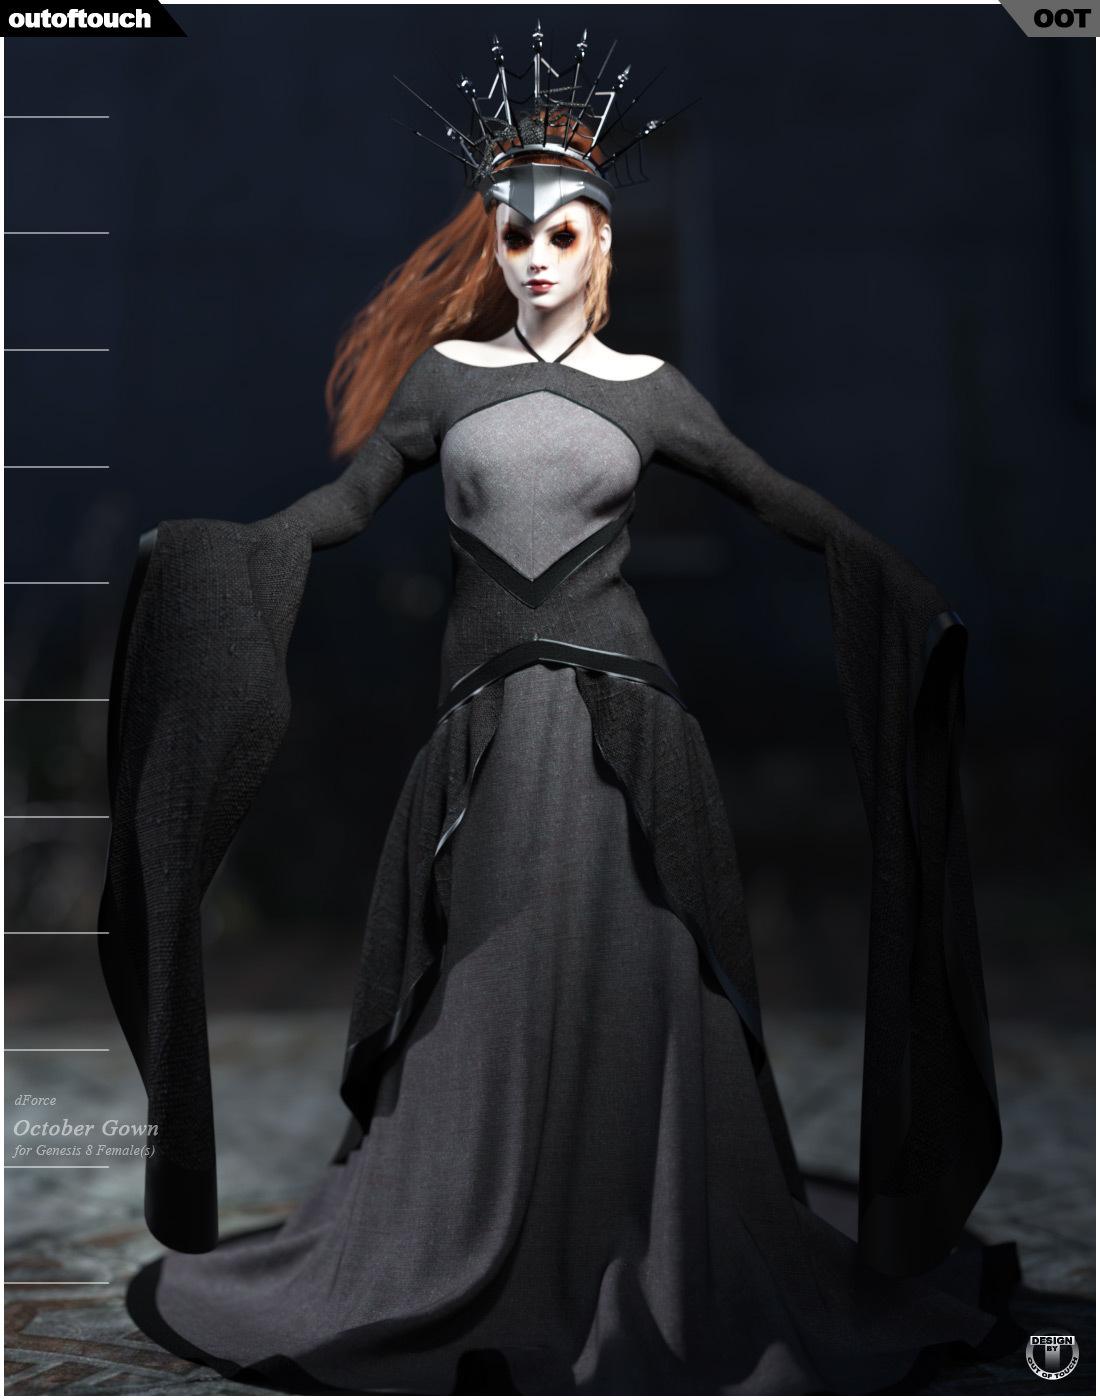 dforce-october-gown-for-genesis-8-females